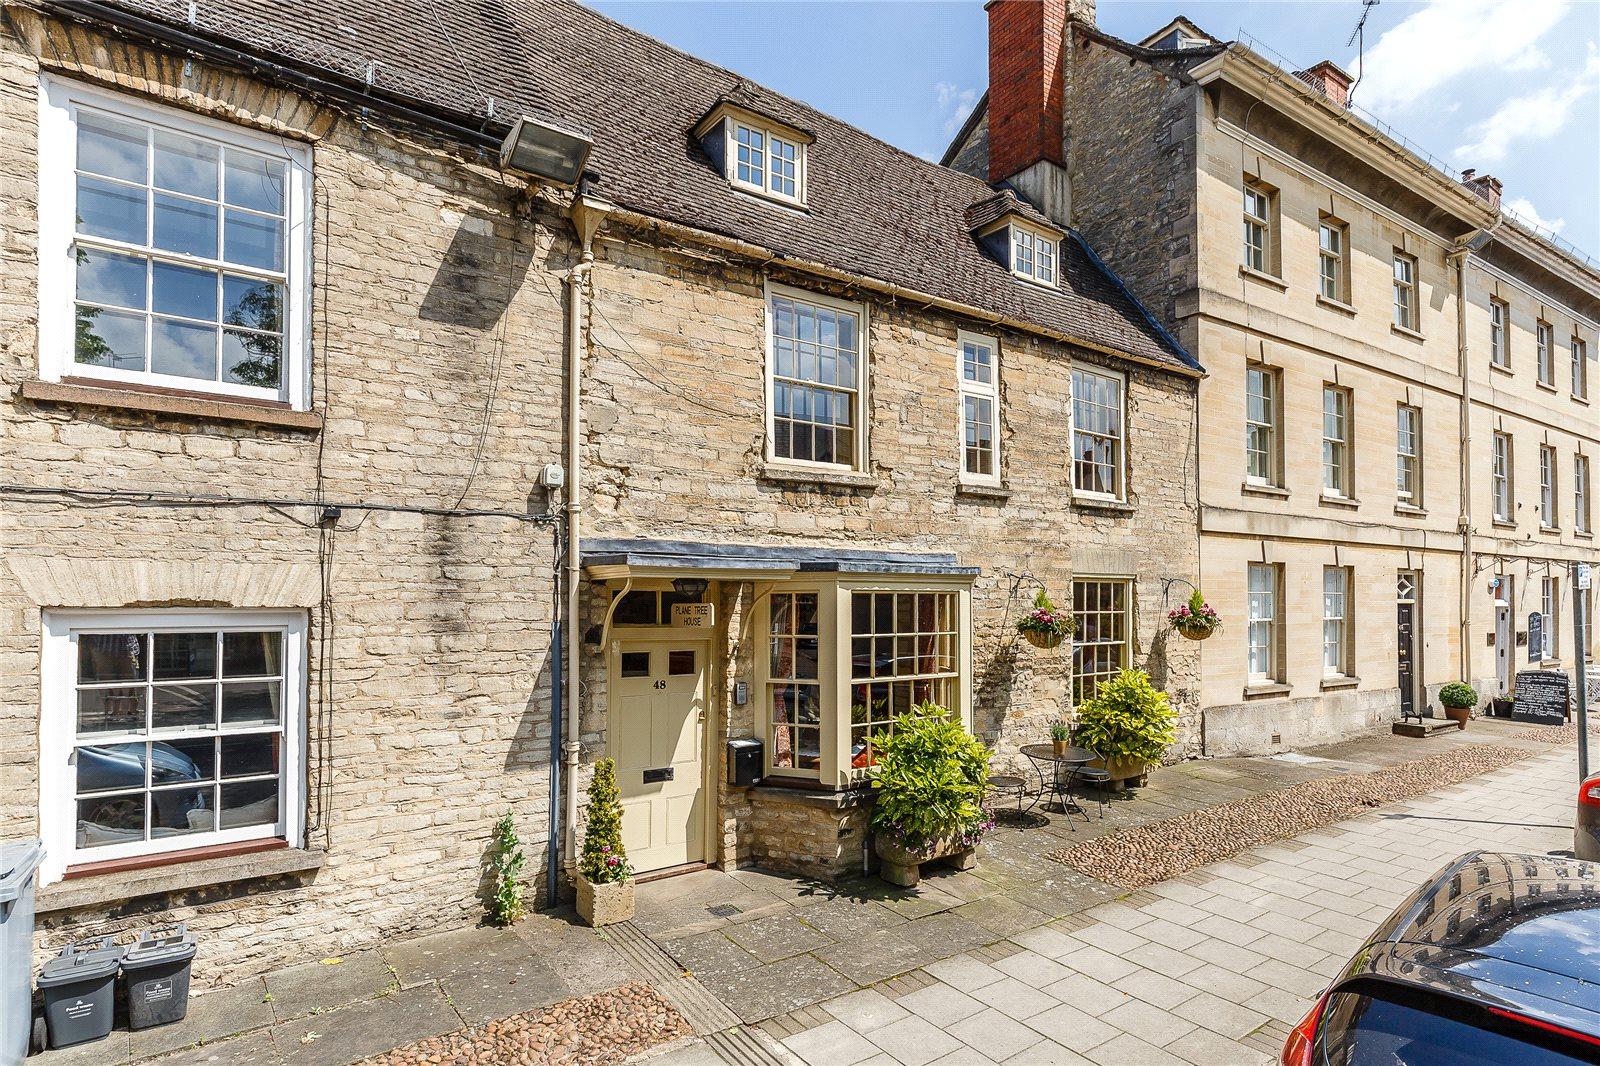 Частный дом для того Продажа на Oxford Street, Woodstock, Oxfordshire, OX20 Woodstock, Англия